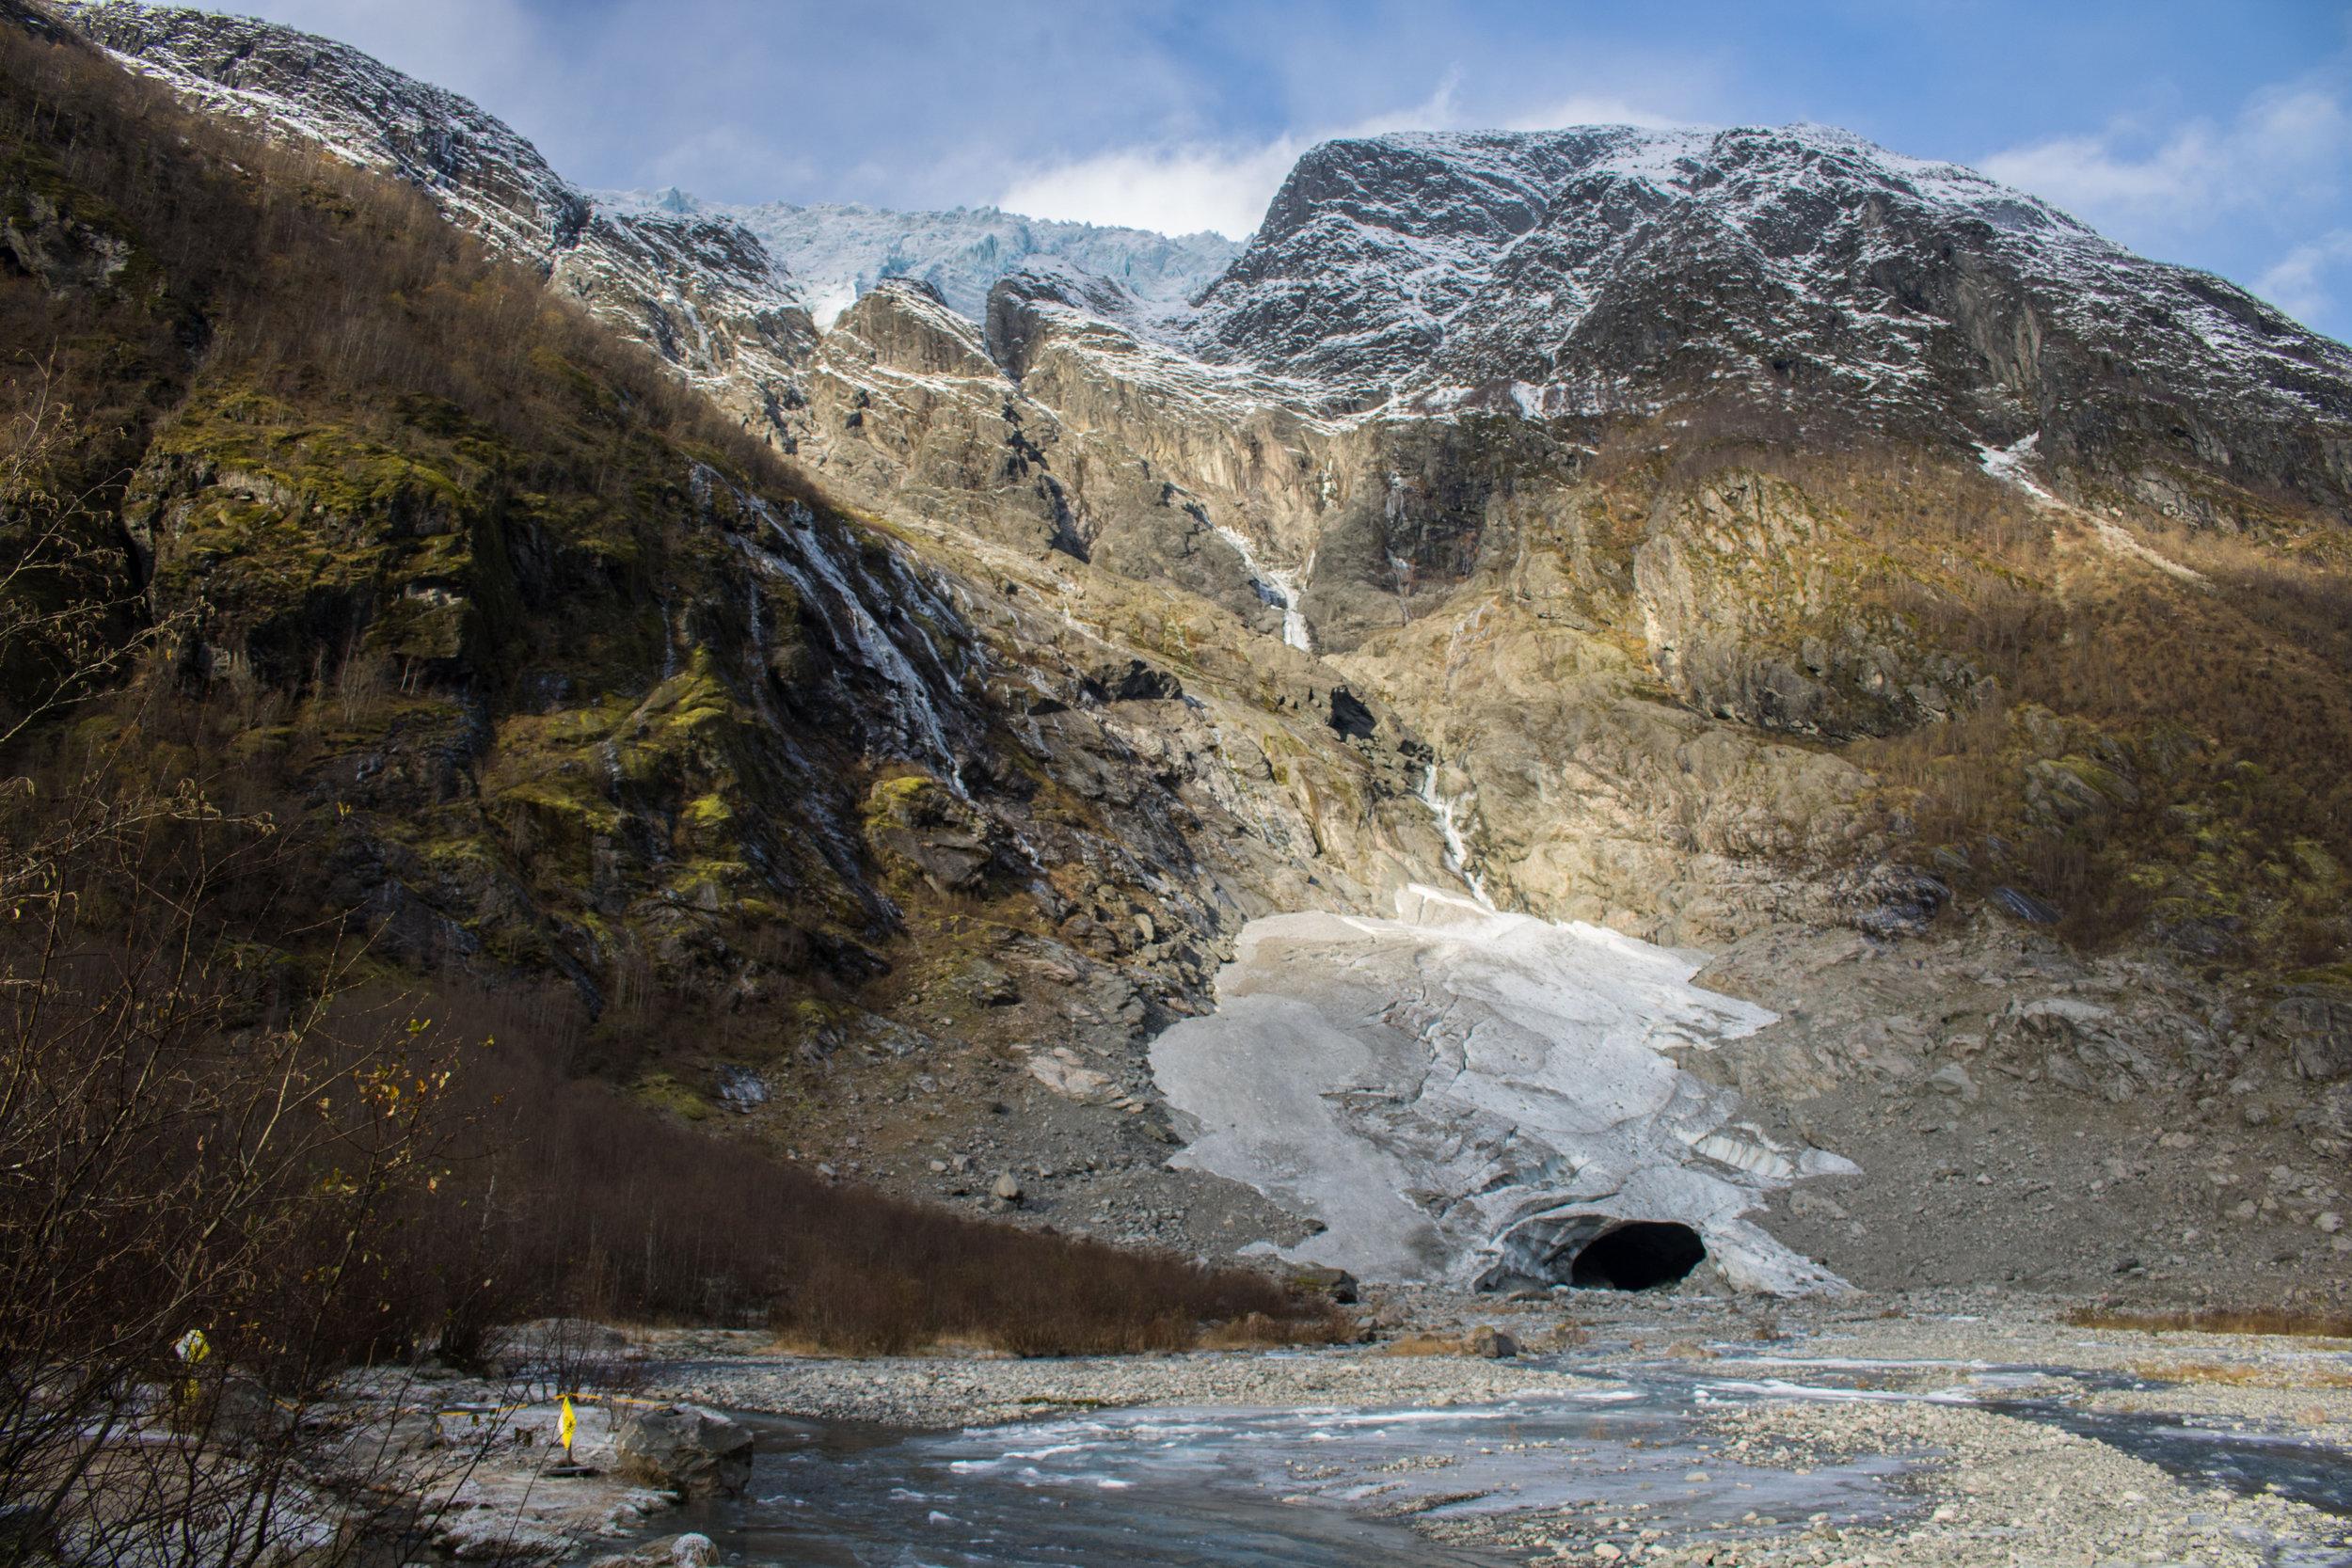 Supphellebreen Glacier 2018